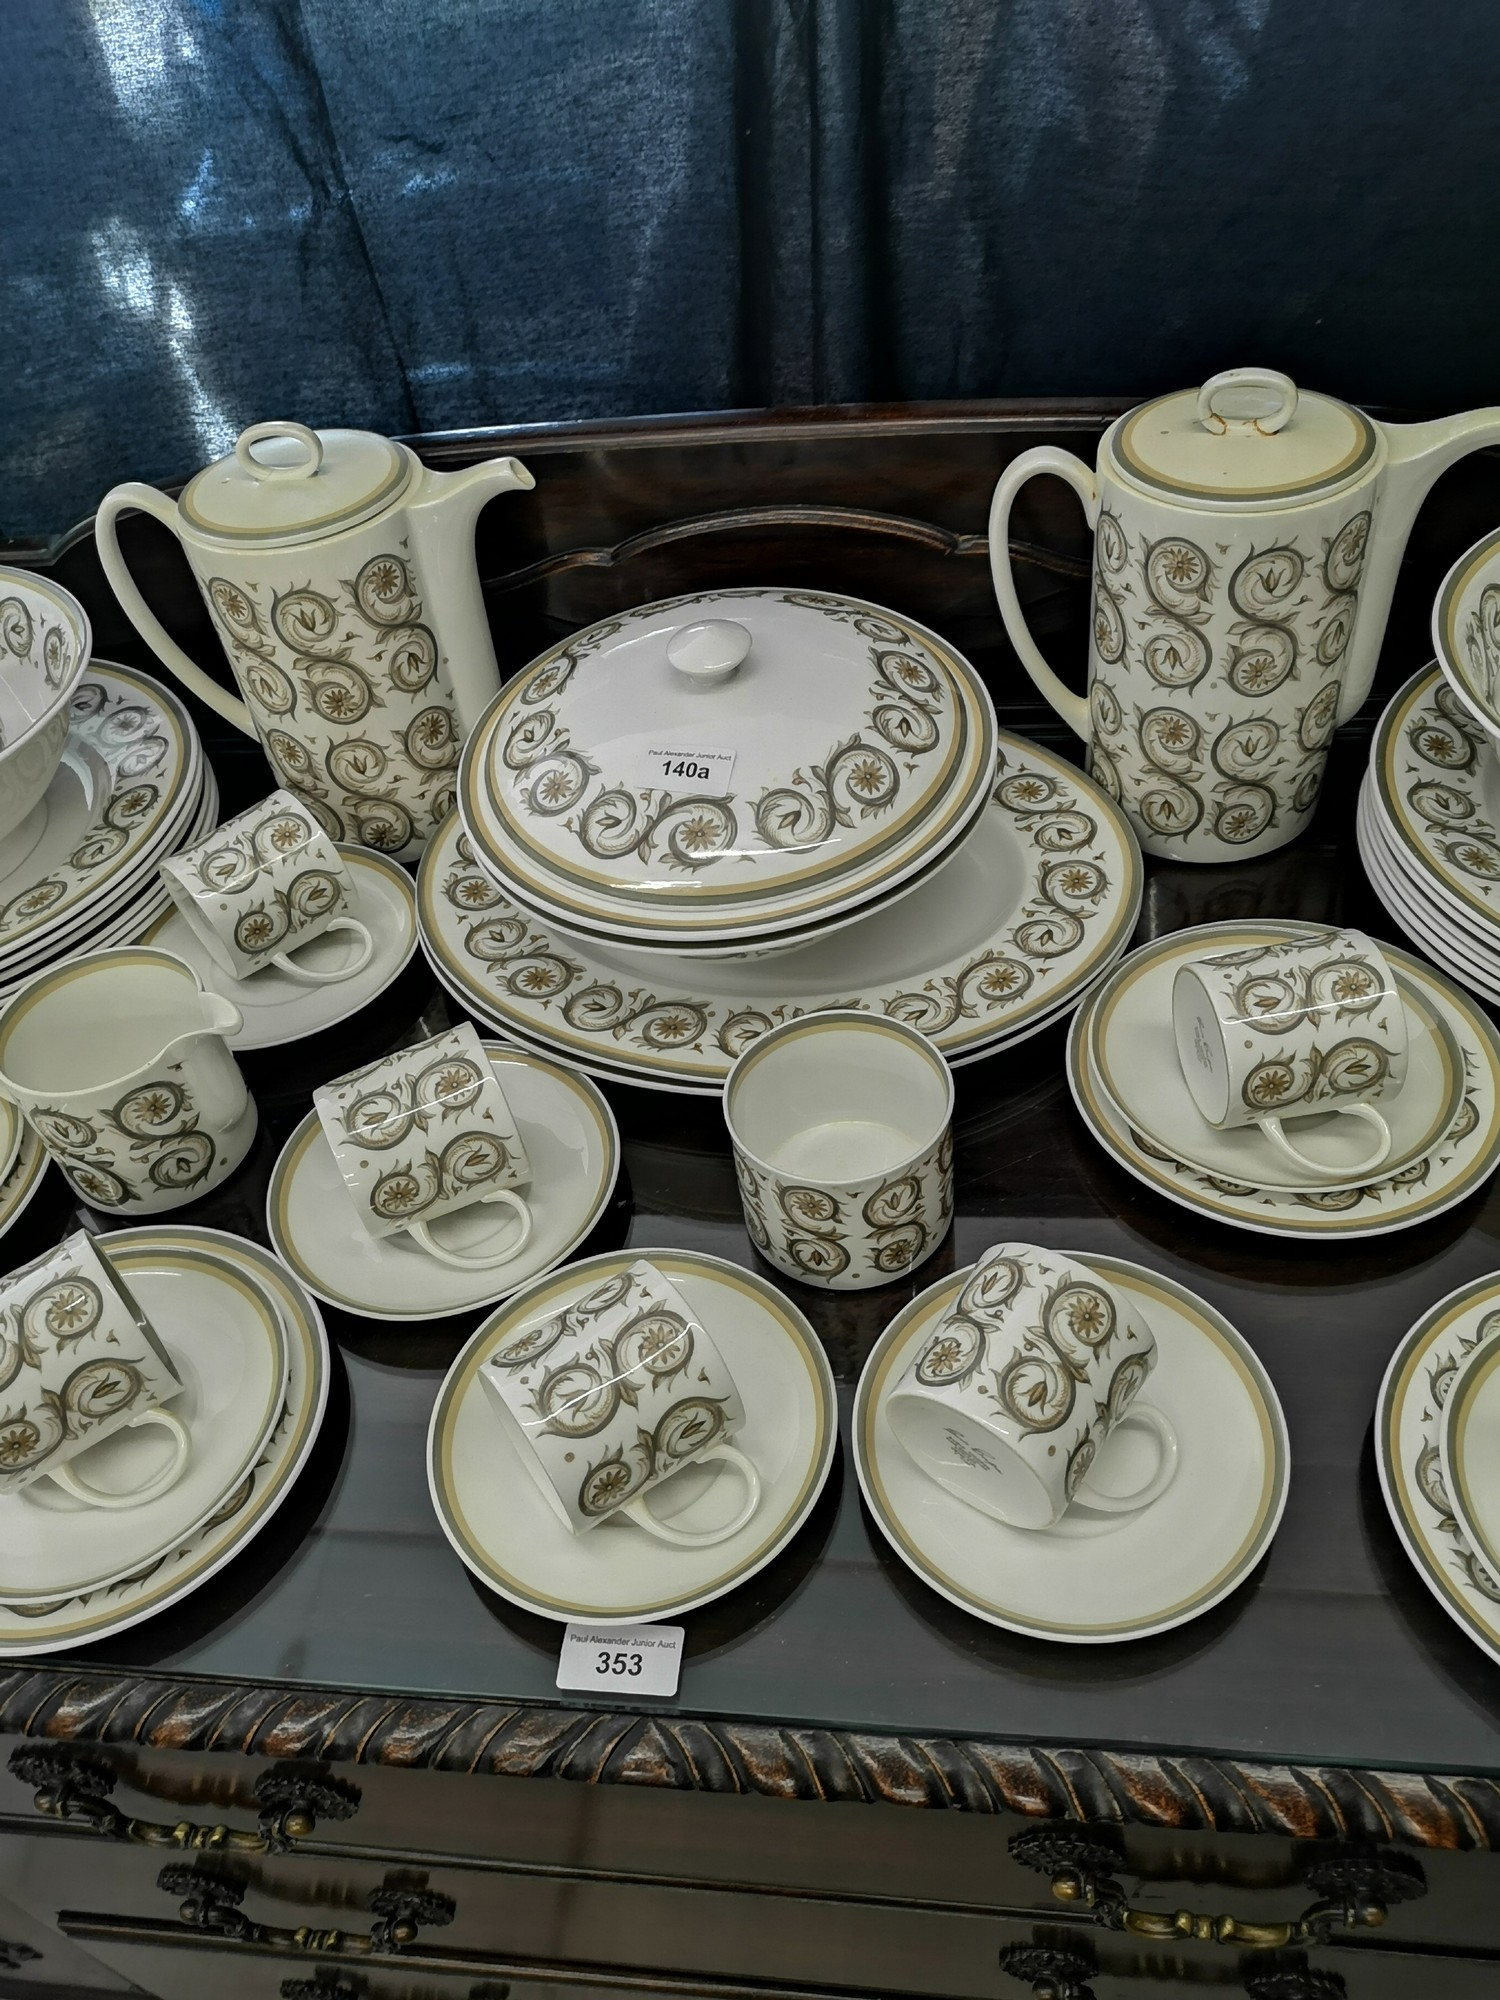 Large suzie Cooper retro venetia pattern tea & dinner service includes tureen tea pots etc. - Image 3 of 5